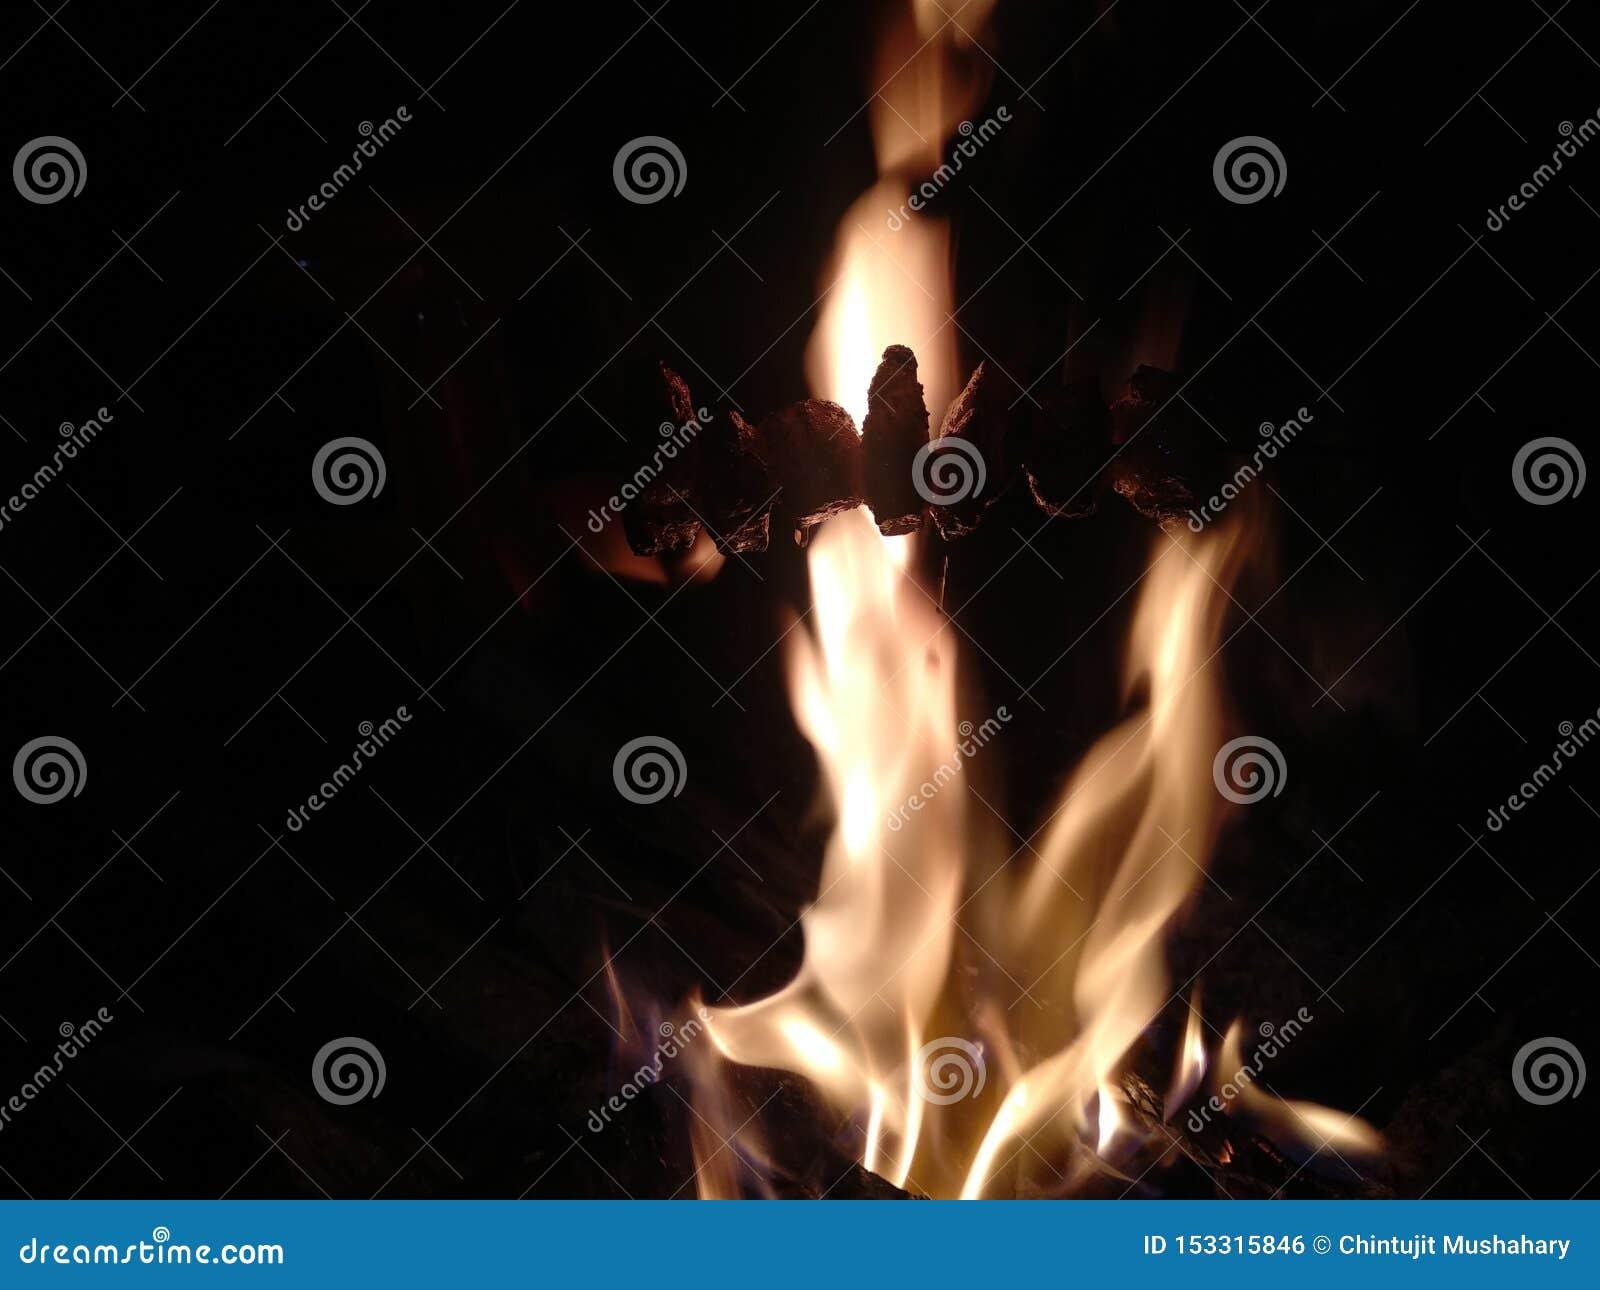 Estilo indiano da carne de porco do fumo da vila do fundo do fogo